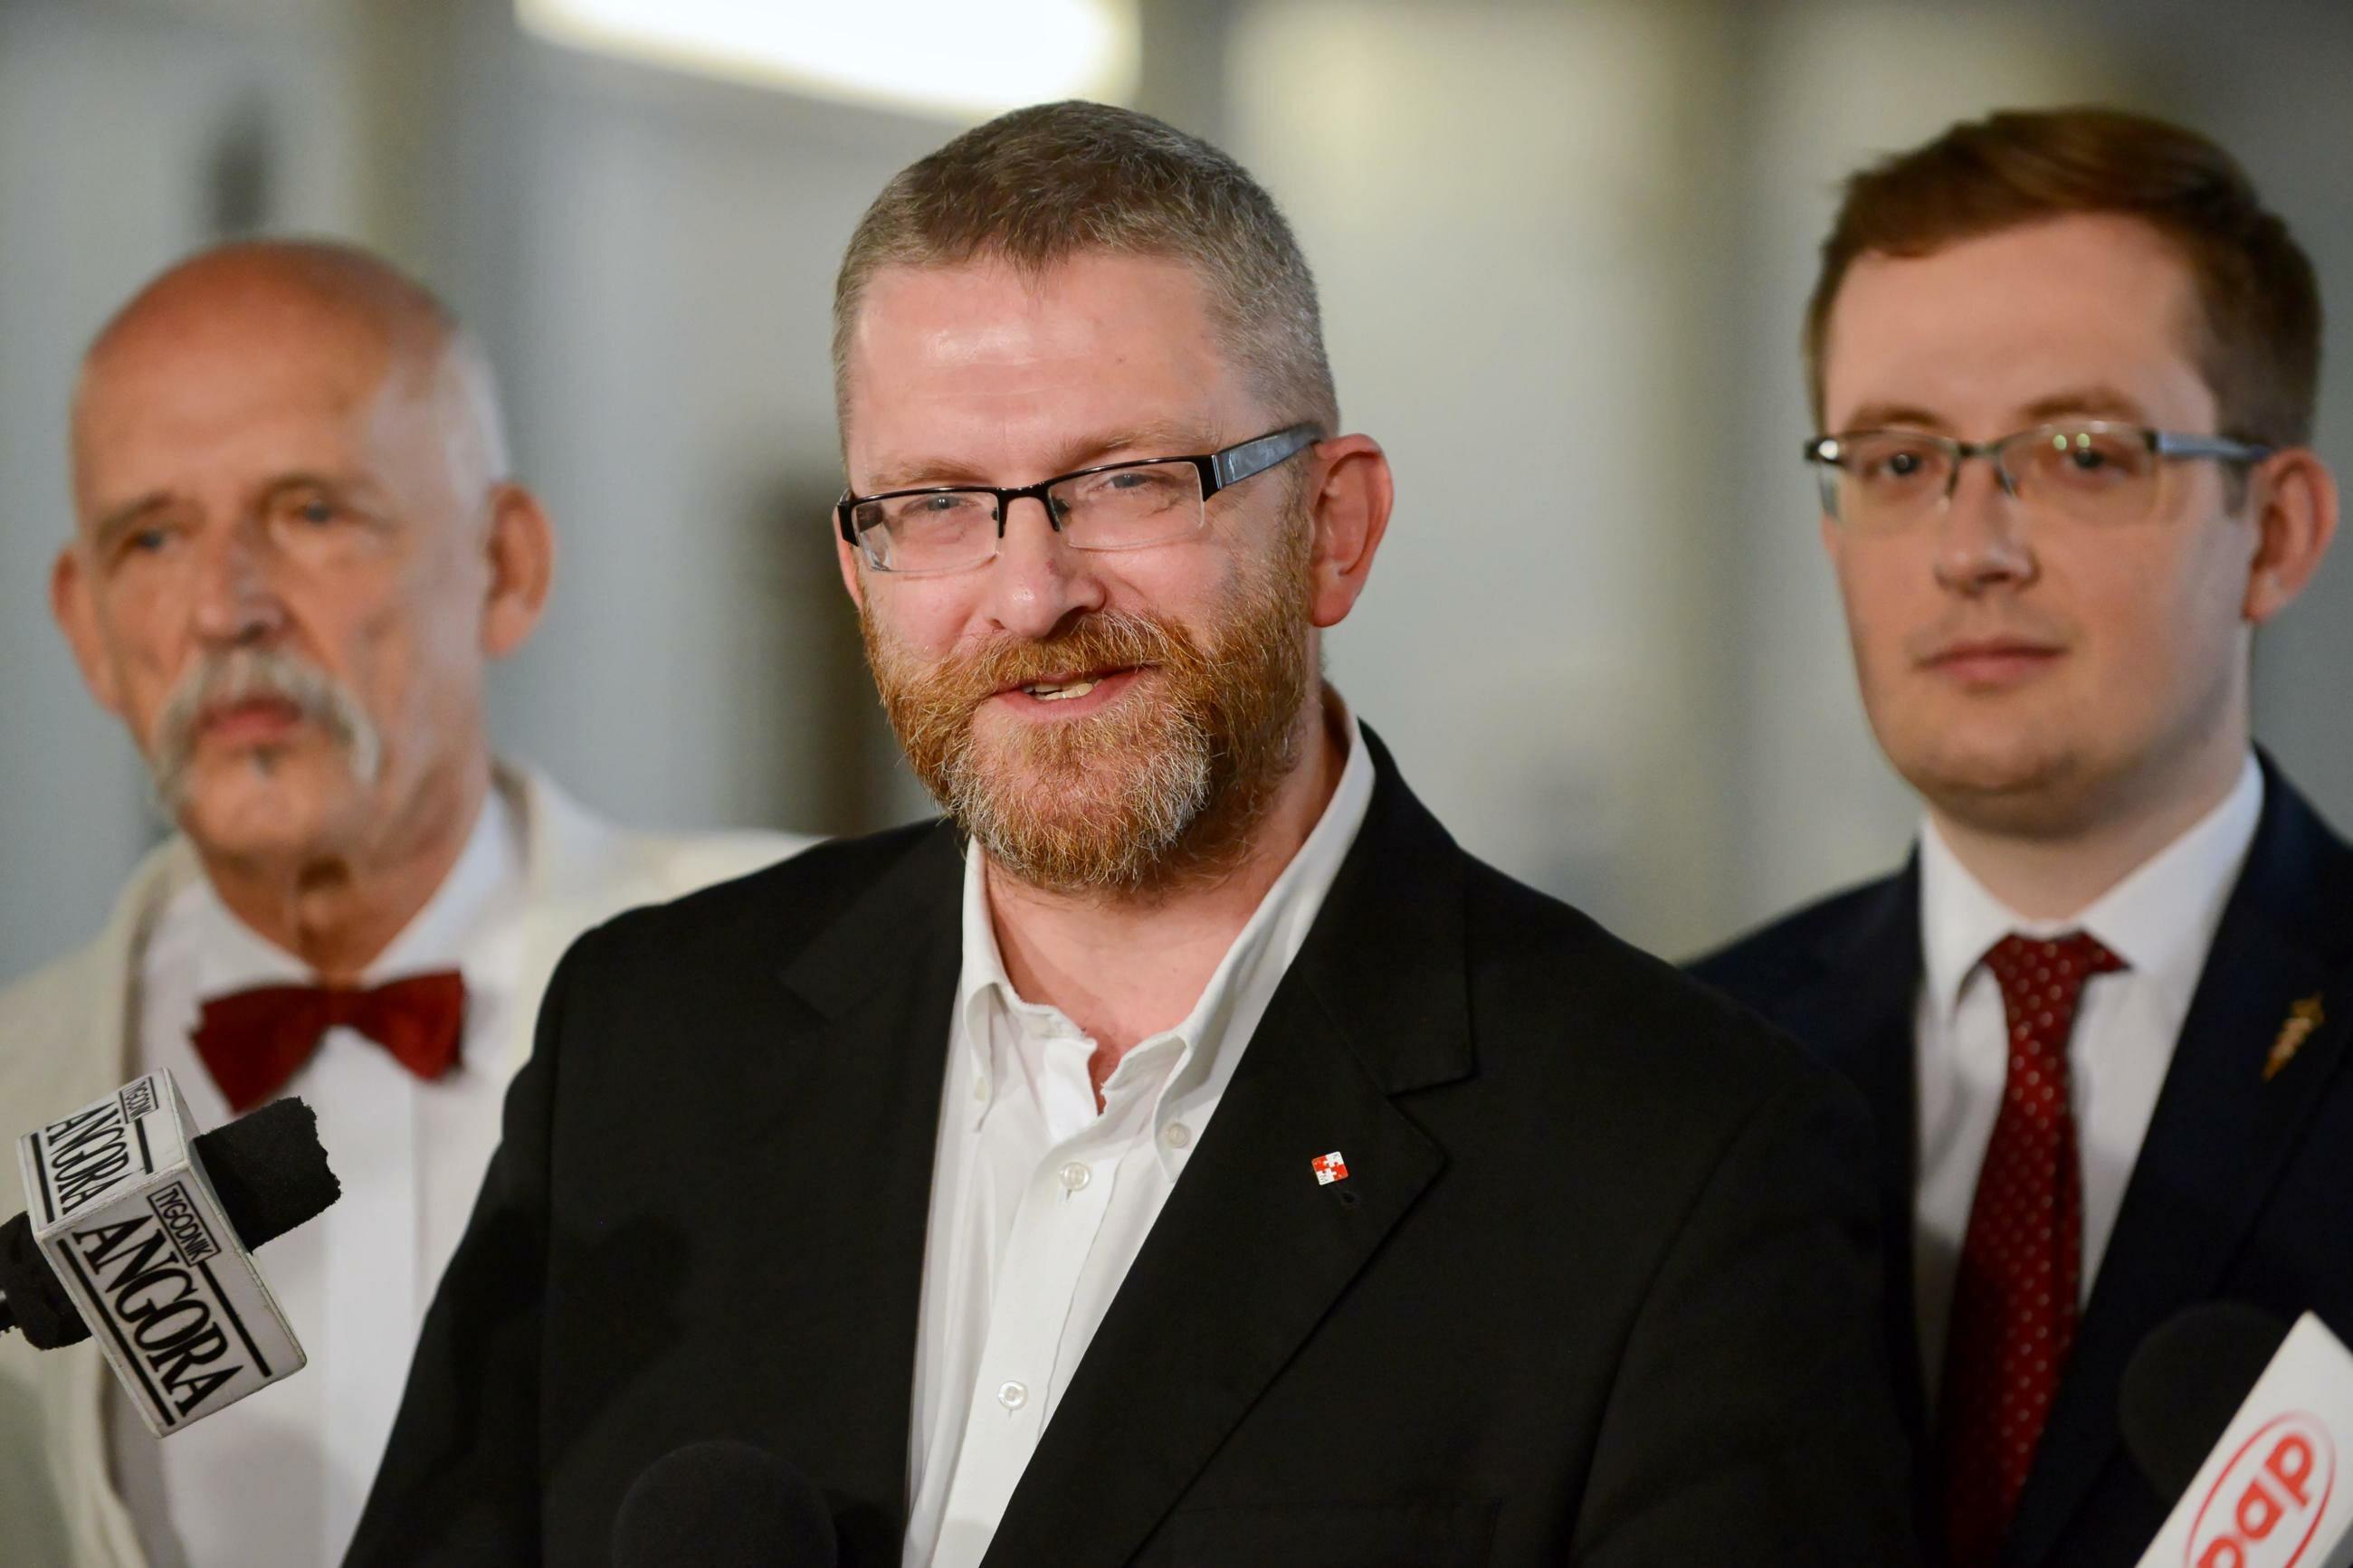 Janusz Korwin-Mikke, Grzegorz Braun, Robert Winnicki